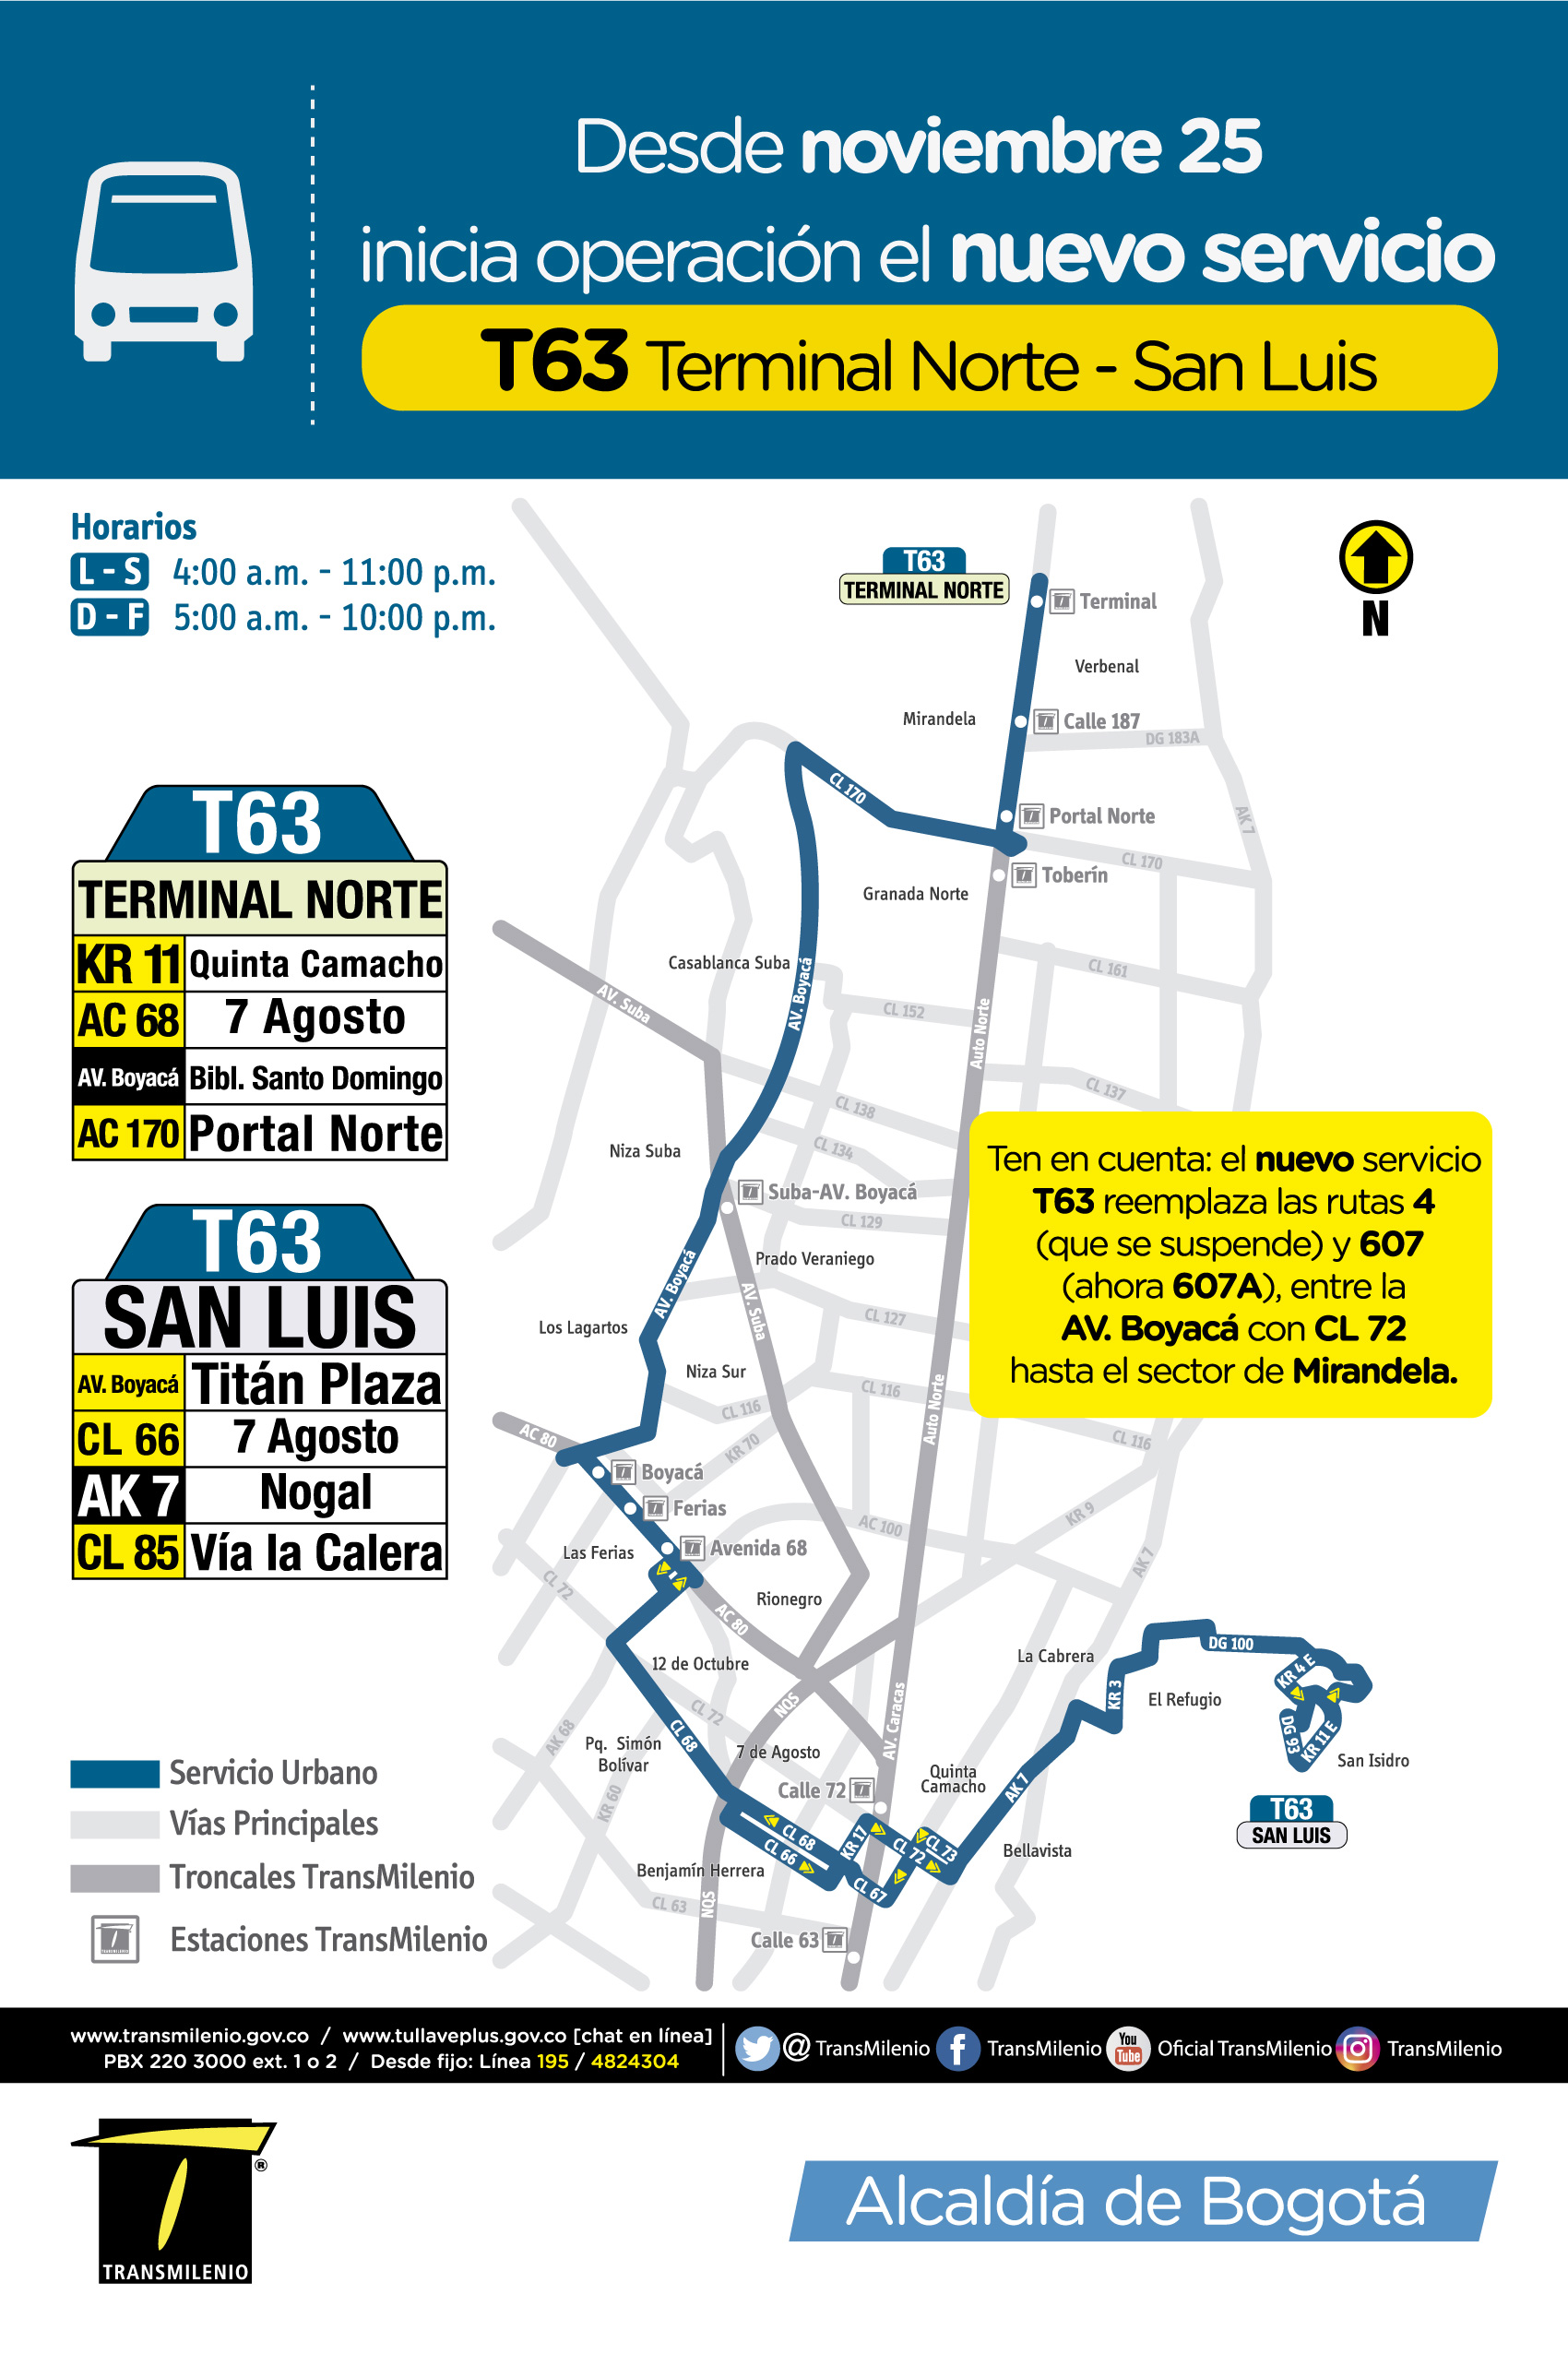 Mapa de la ruta T63